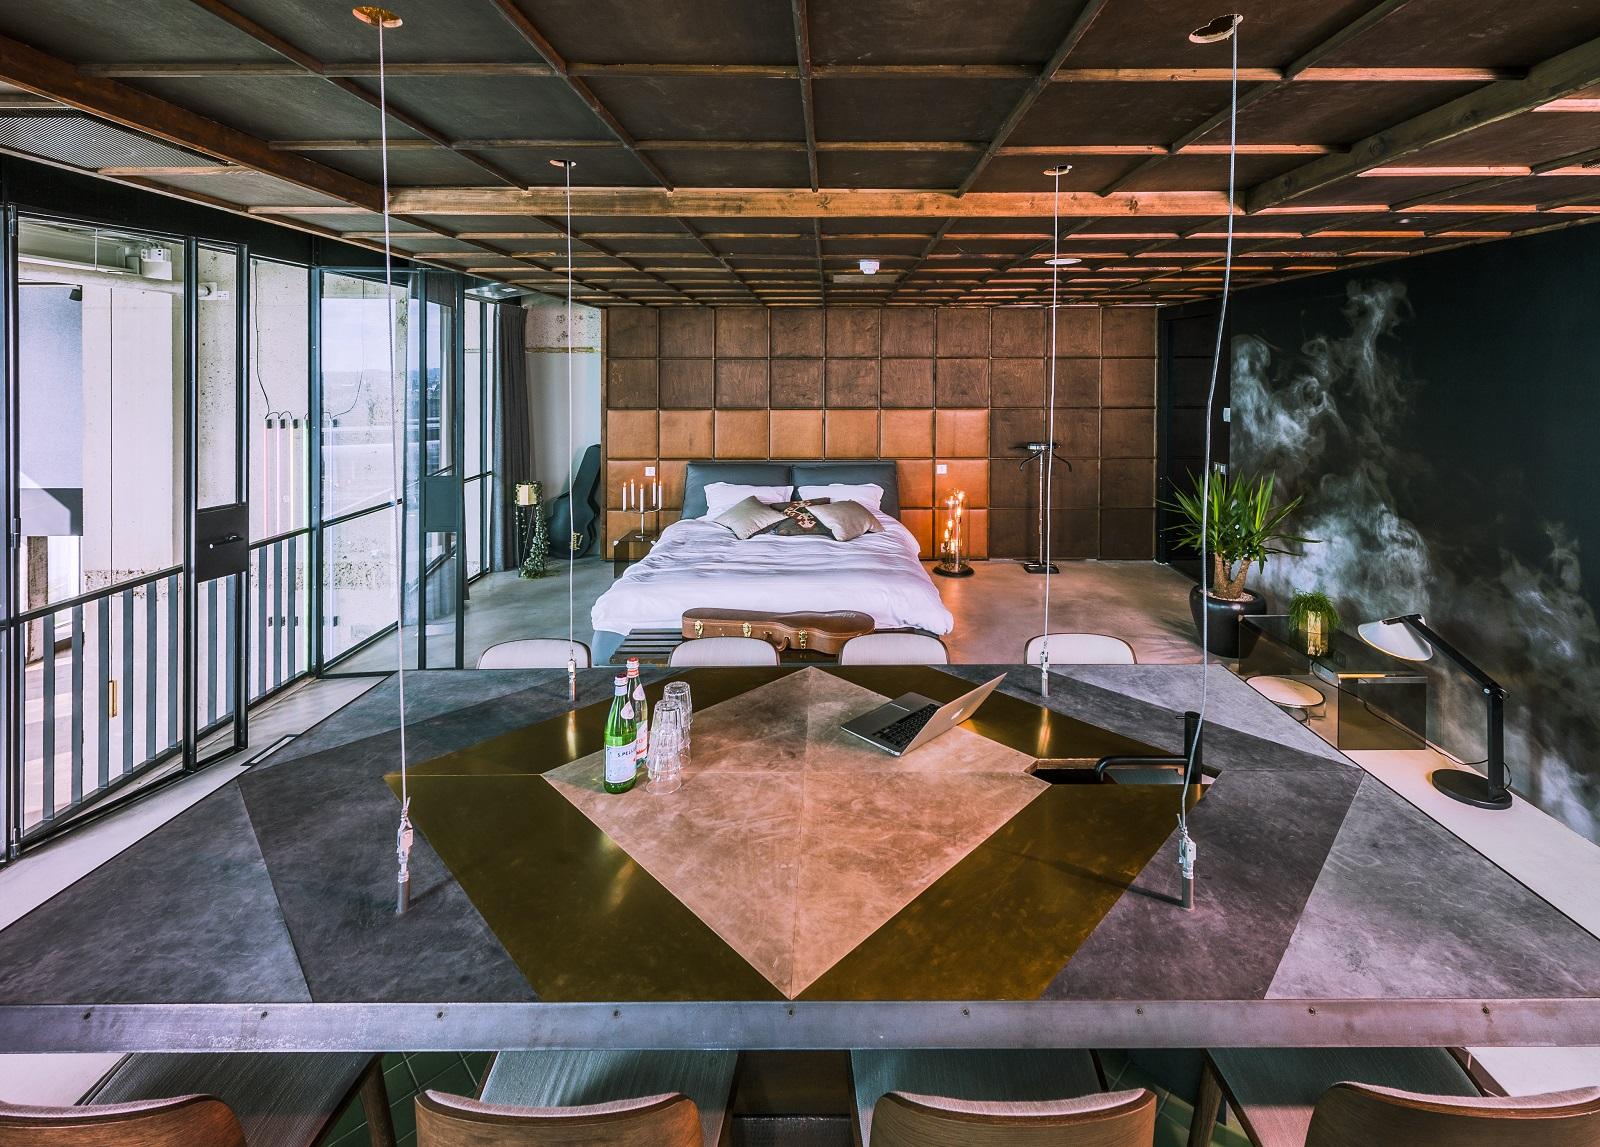 Binnen in a 39 dam toren the loft is spectaculaire eventspace - Woonkamer design bibliotheek ...